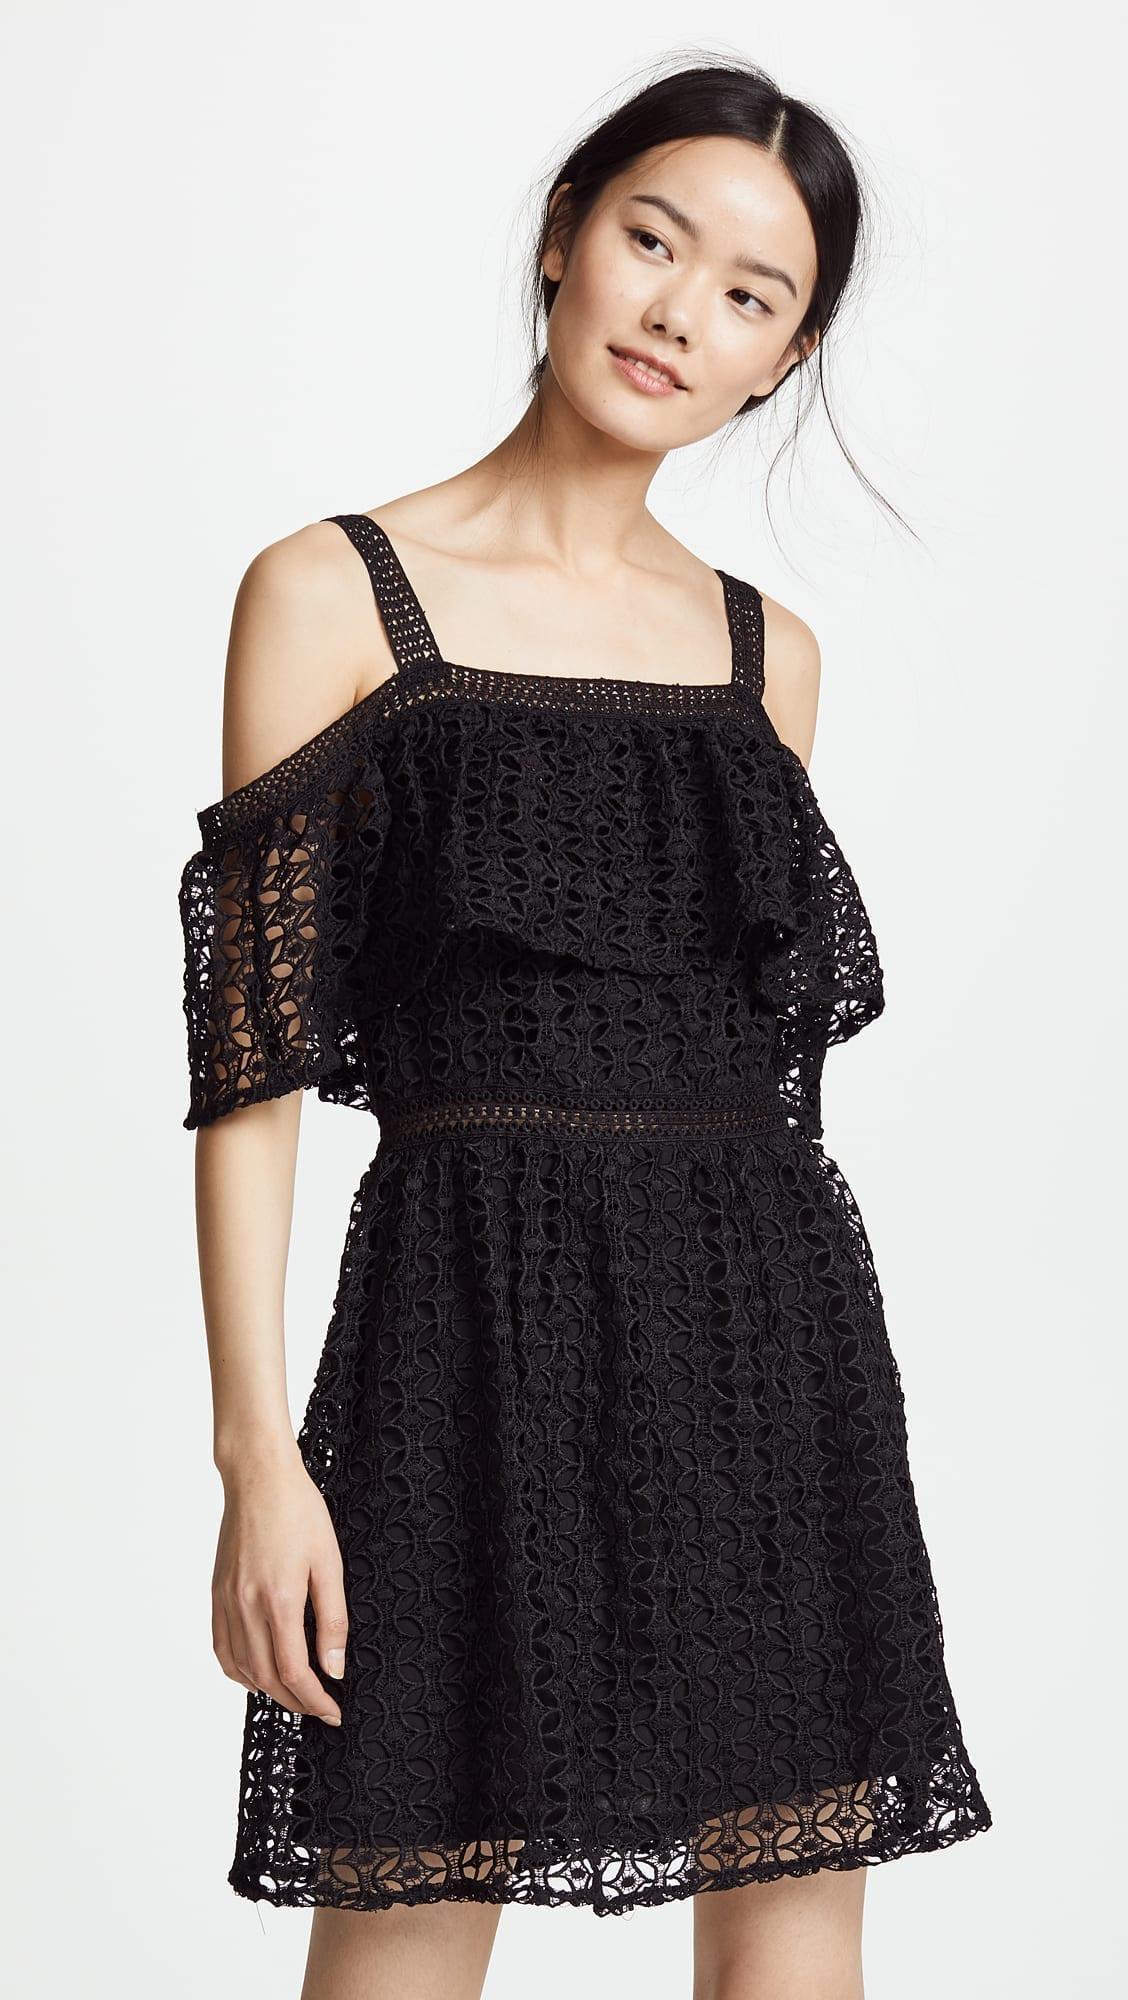 JACK BY BB DAKOTA Aitana Black Dress